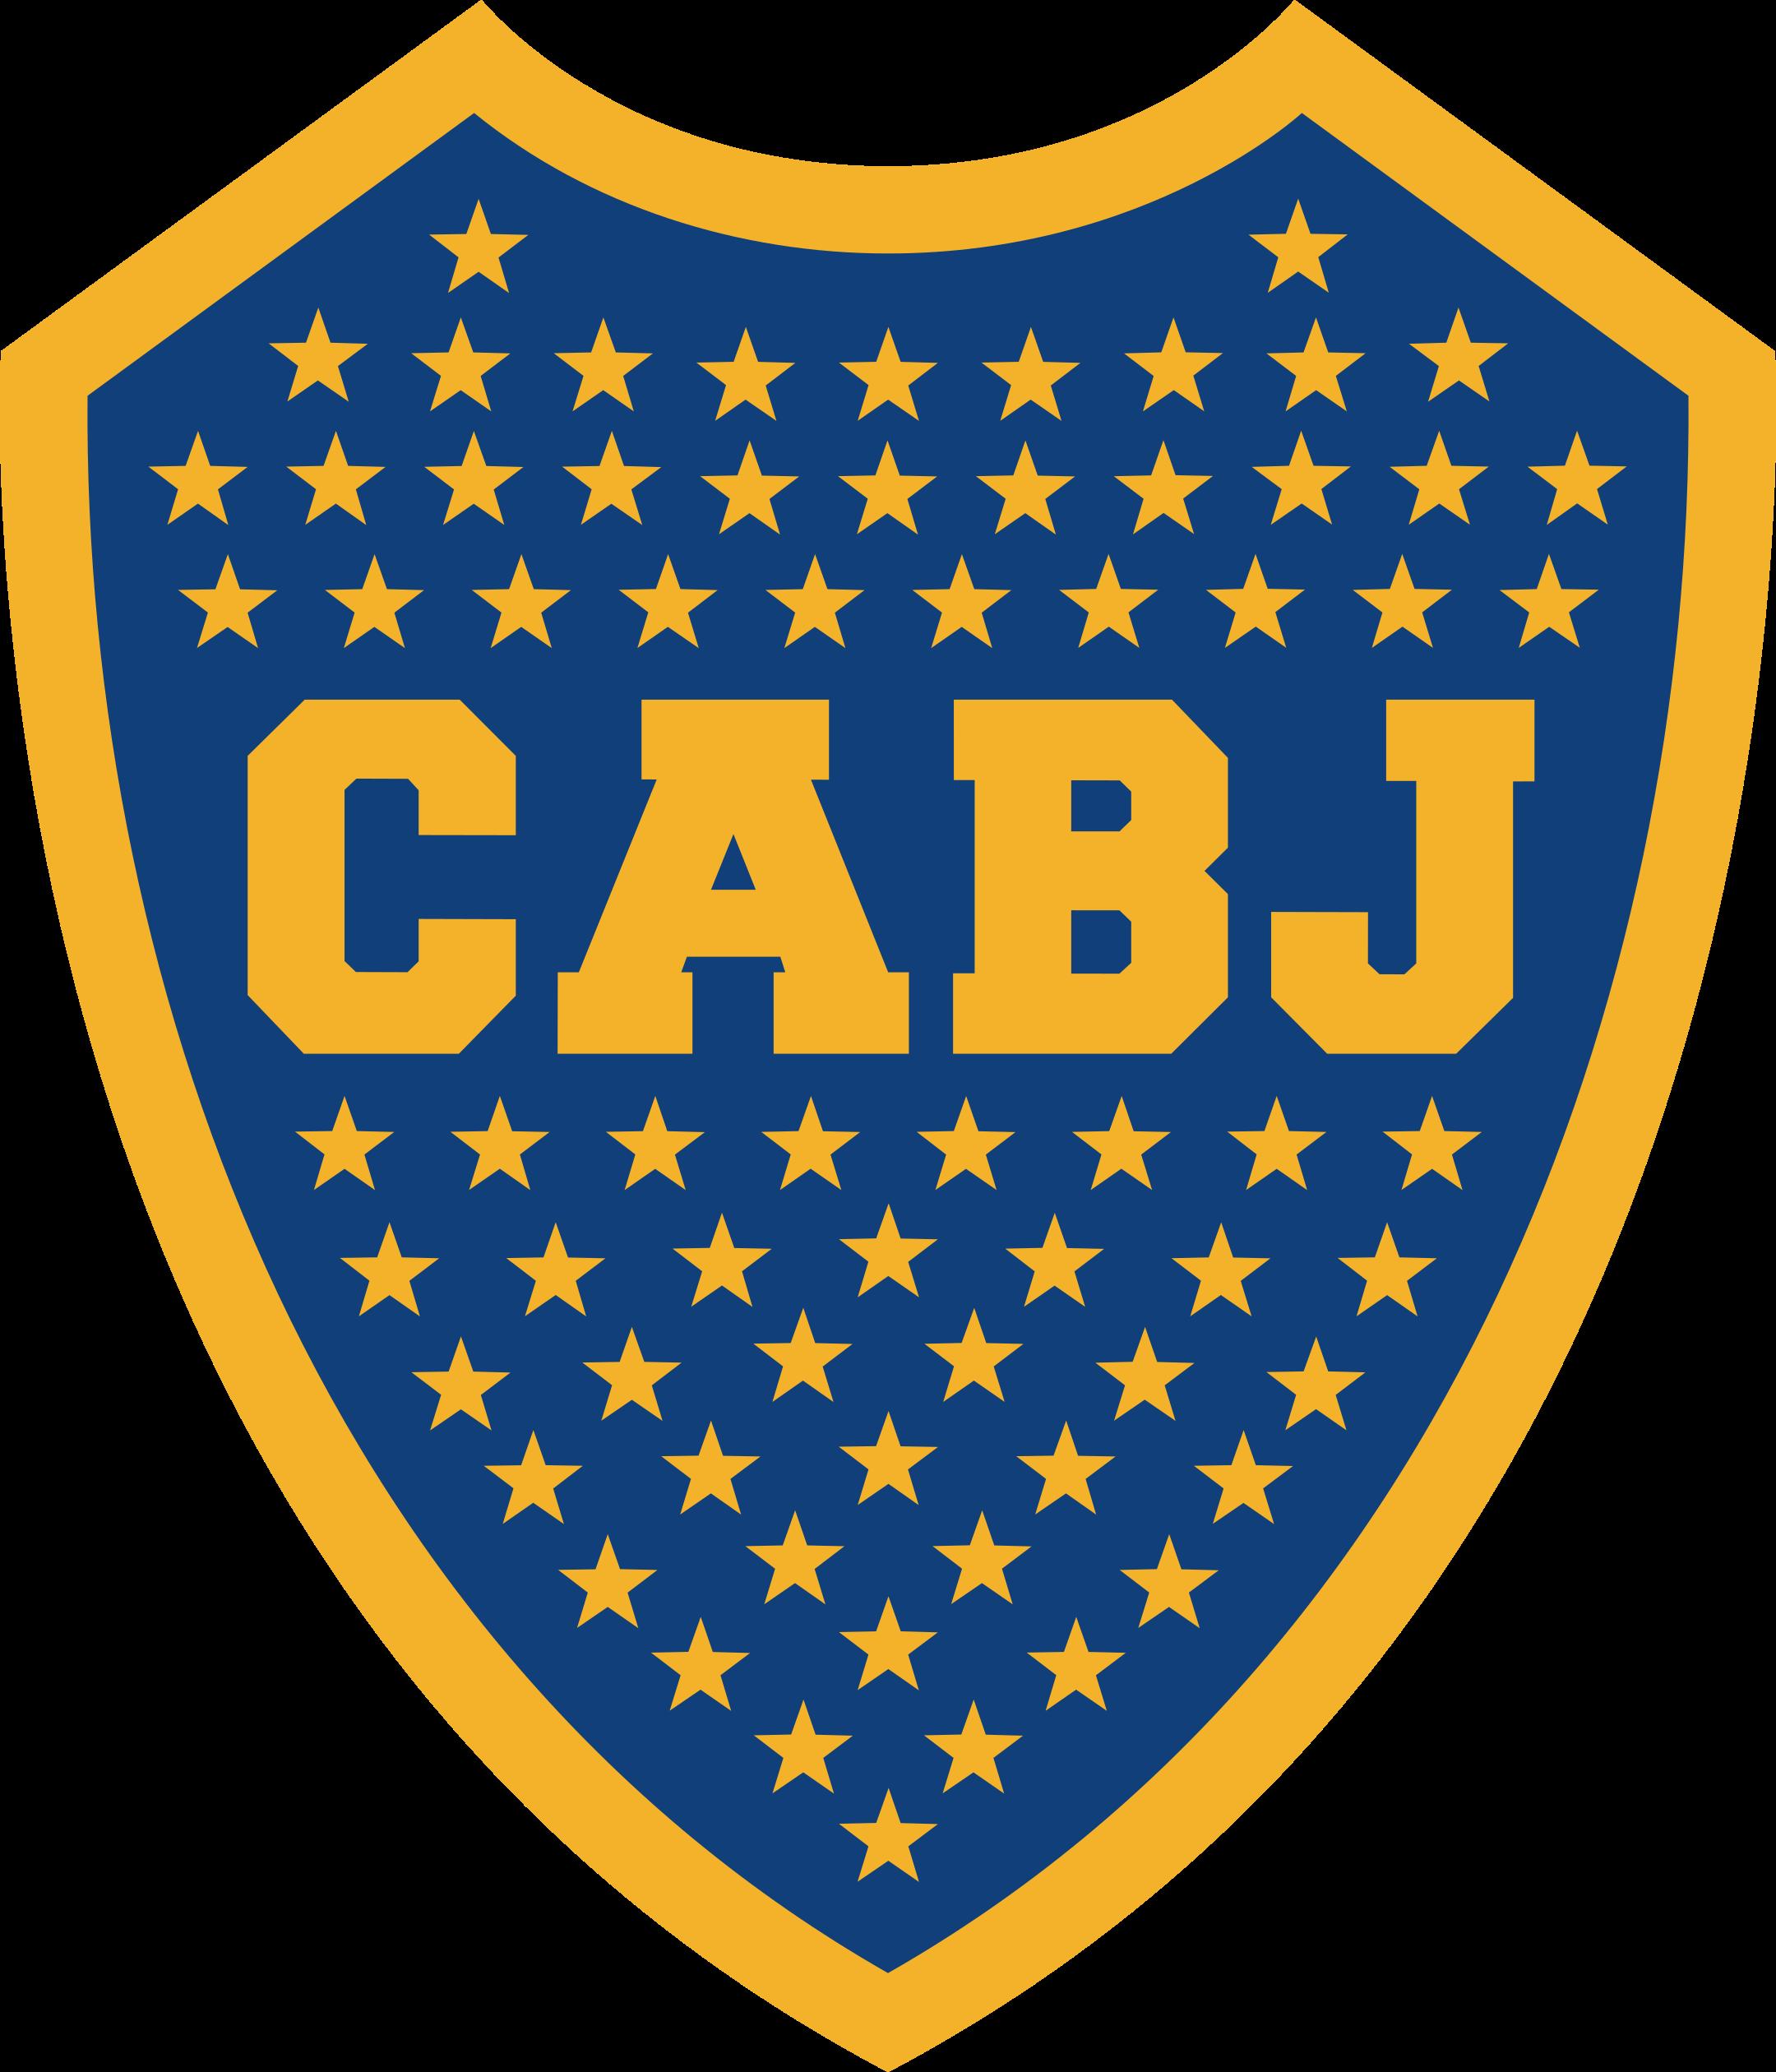 boca juniors logo escudo 1 1 - Boca Juniors Logo - Escudo